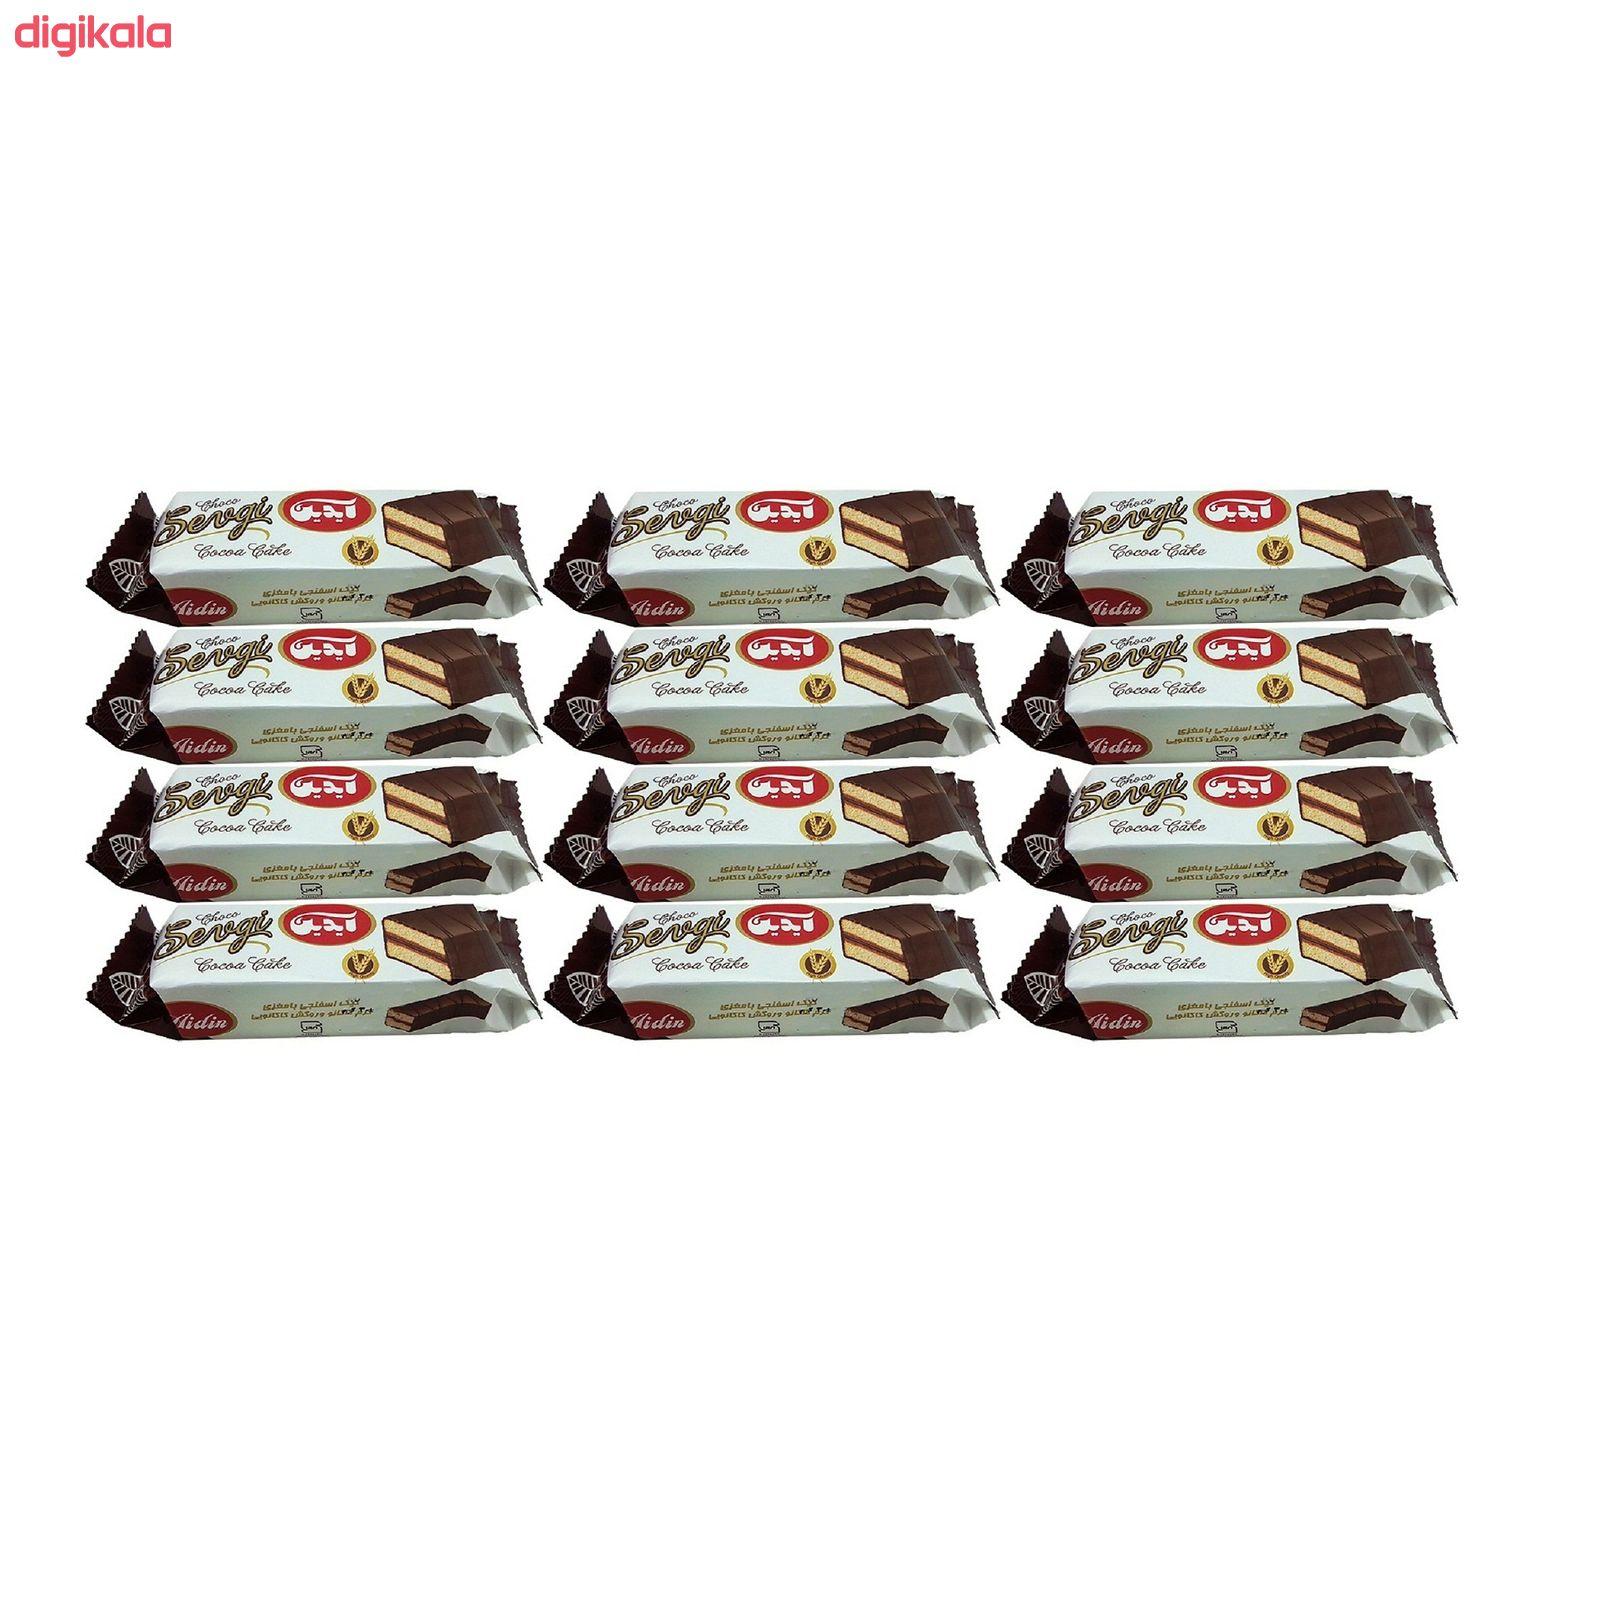 کیک اسفنجی با مغزی کرم کاکائو و روکش کاکائویی آیدین - 30 گرم بسته 12 عددی  main 1 2